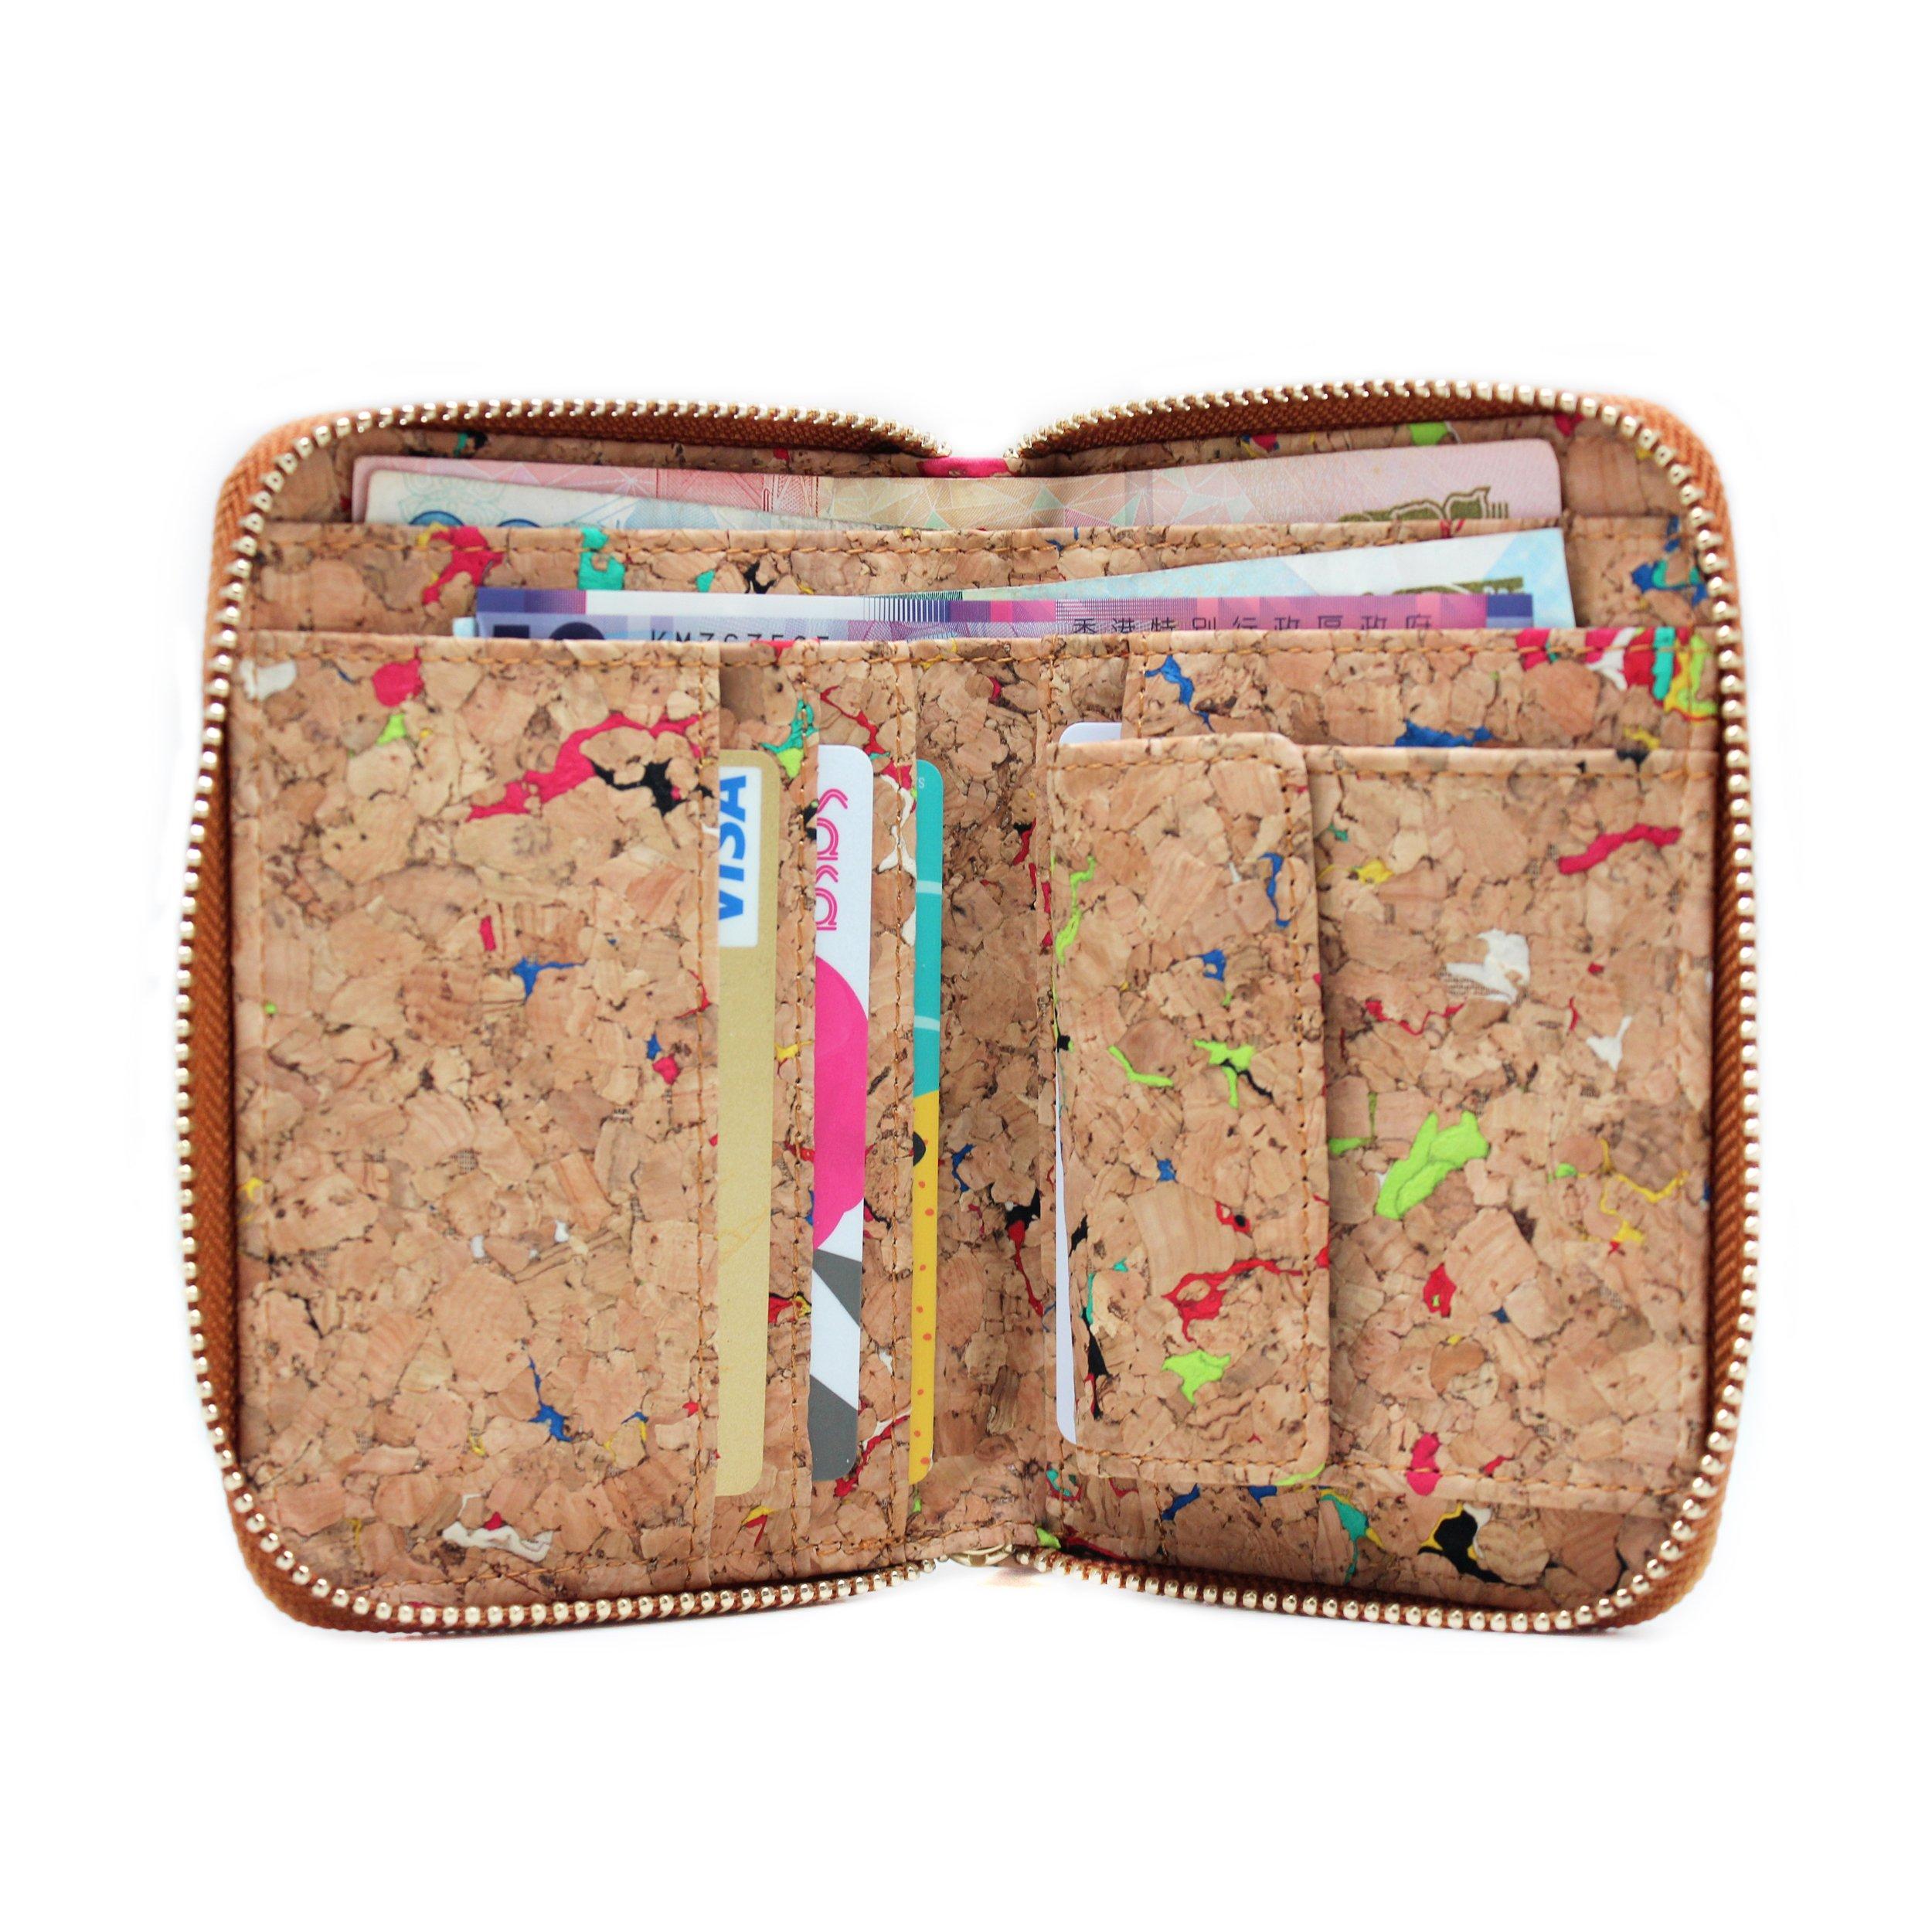 boshiho Fashion Cork Wallet Zipper Around Design Bifold Purse Wallet with Coin Pocket Holder Eco Friendly Vegan Gift (Color 1)